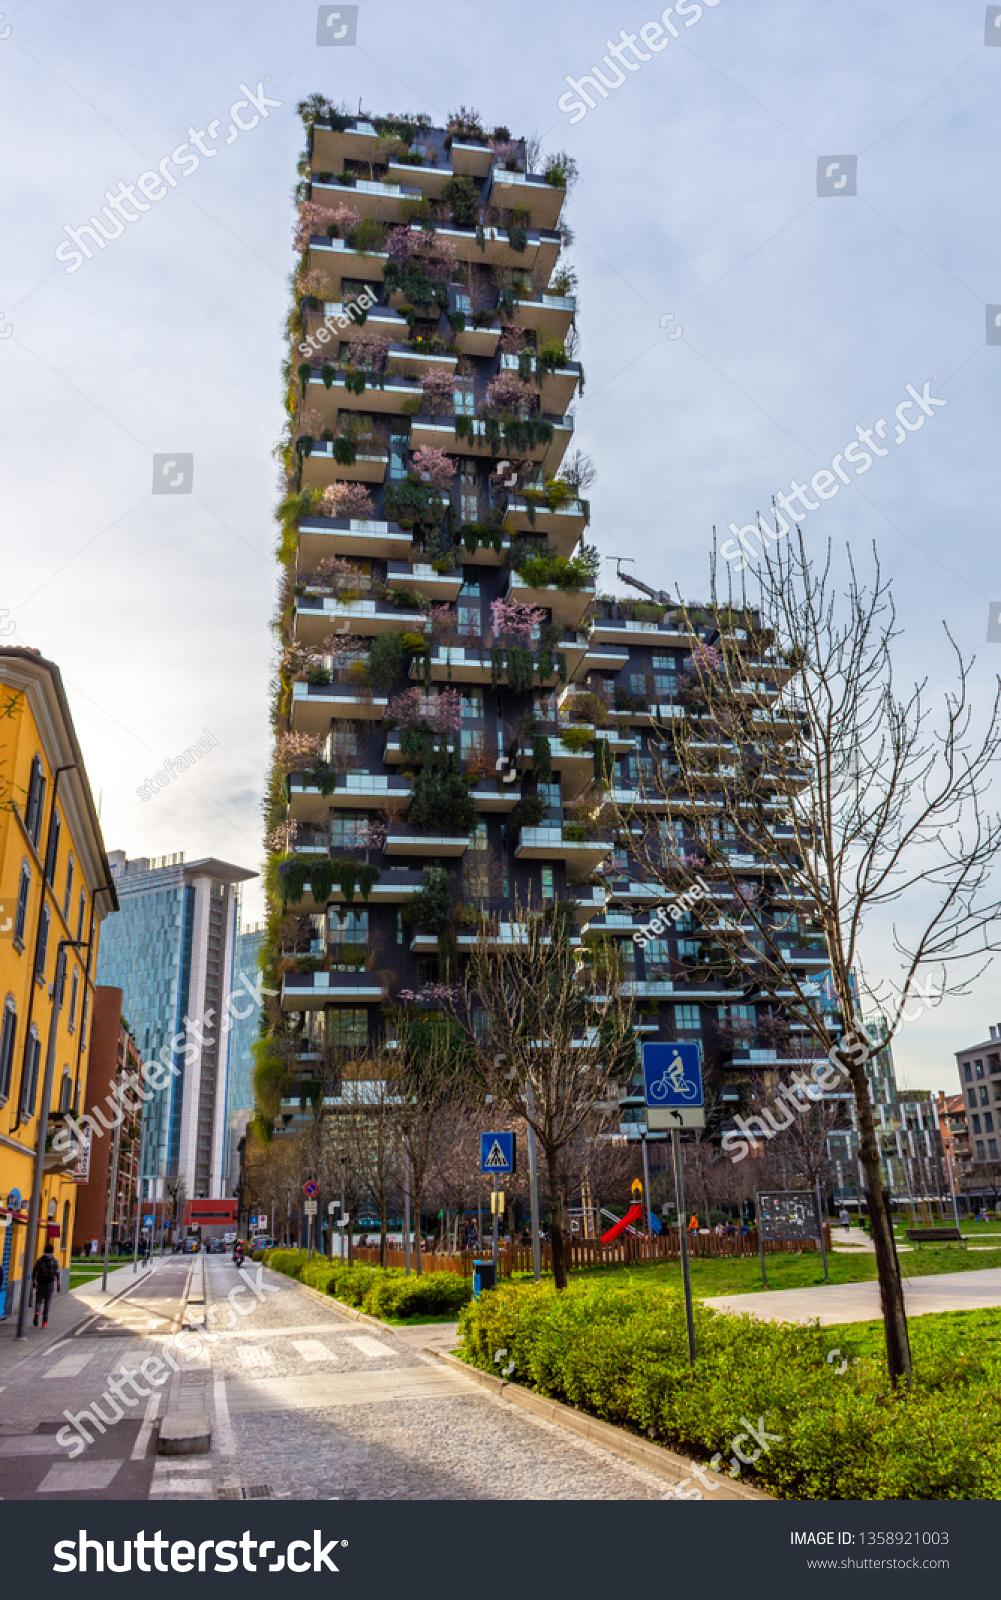 Foto Bosco Verticale Milano nuova york bilder, stockfoton och vektorer med   shutterstock